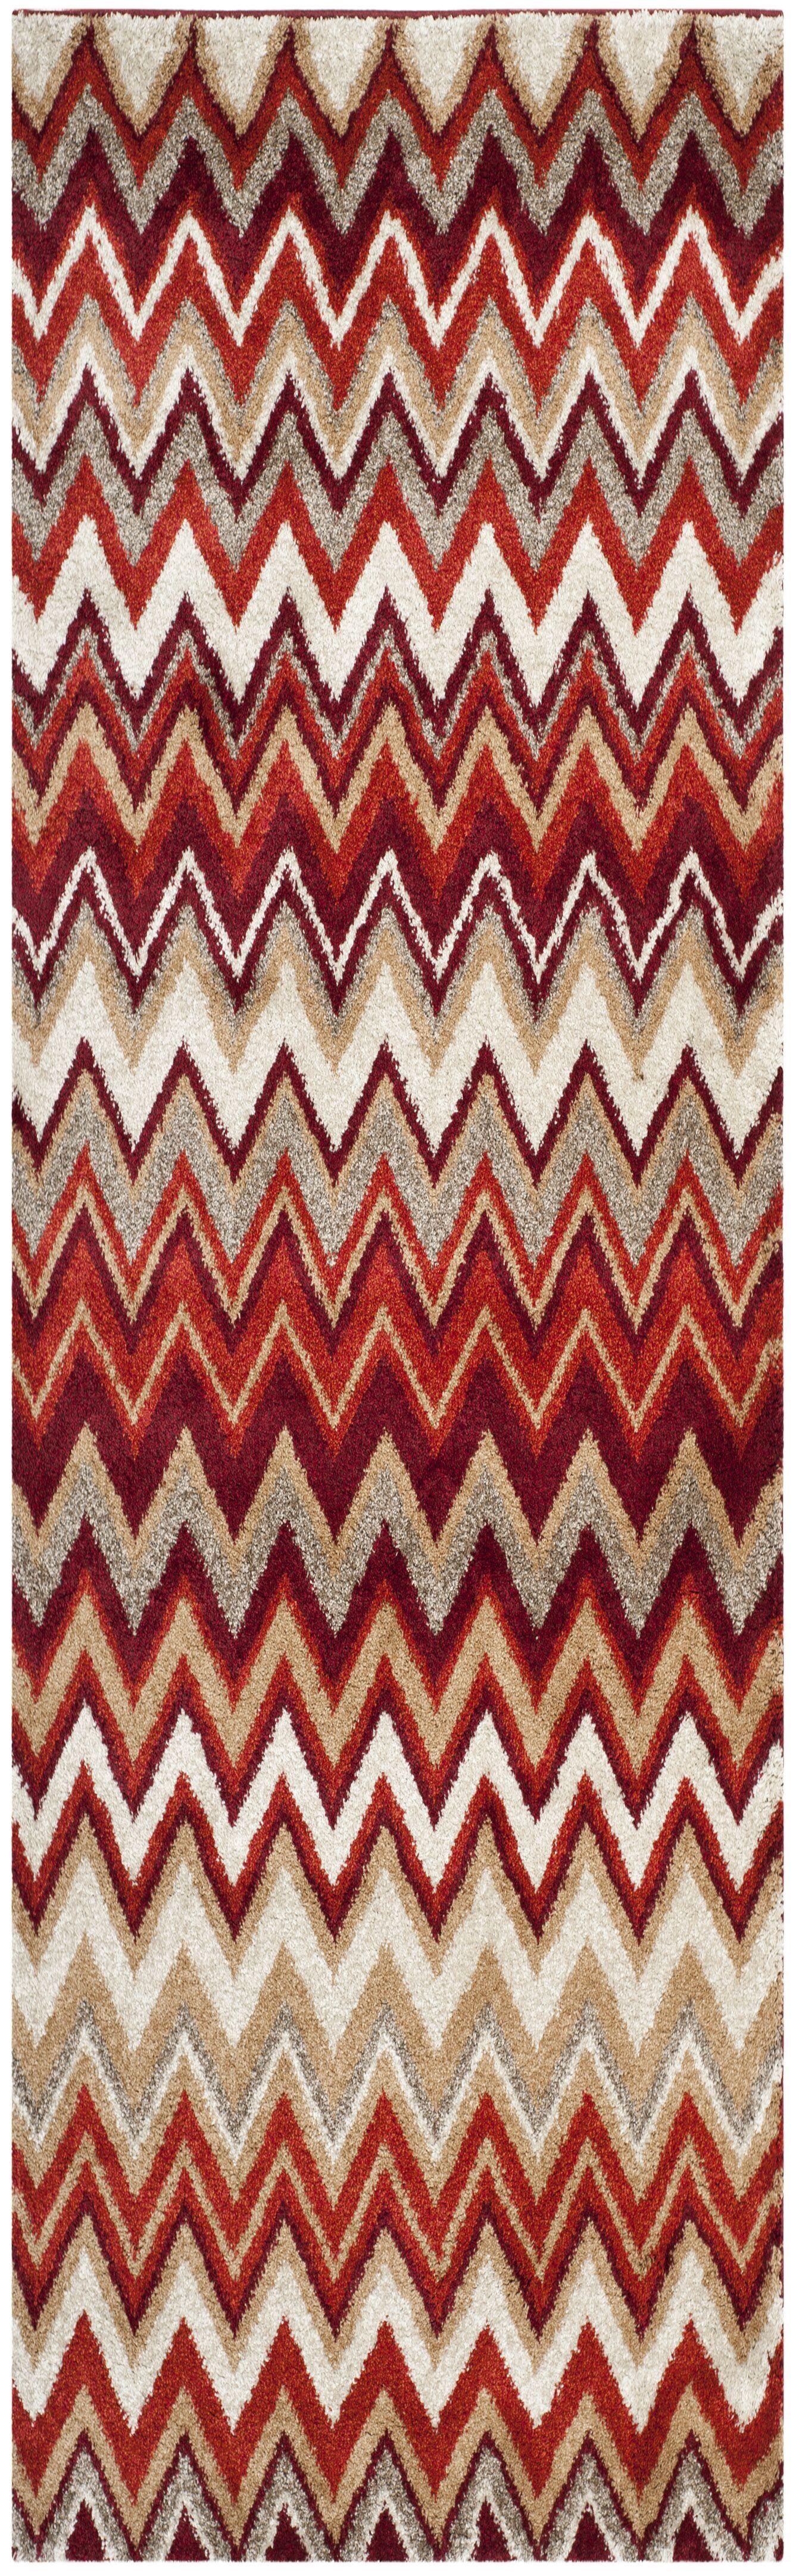 Tahoe Beige / Terracotta Geometric Rug Rug Size: Runner 2'3